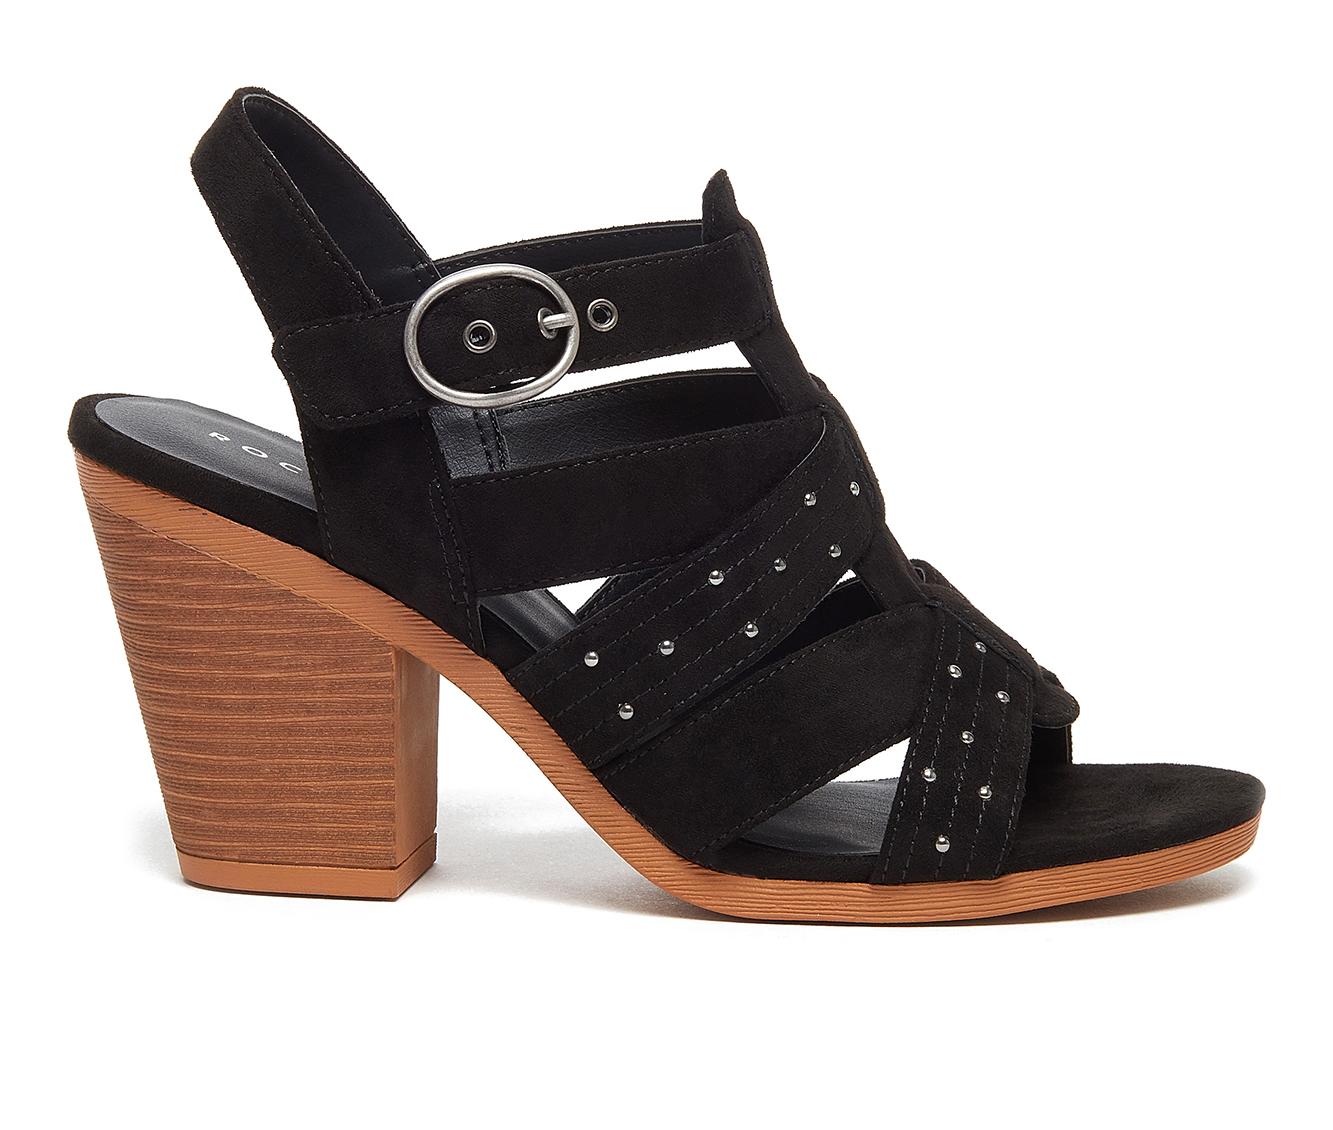 Rocket Dog Yeehaw Women's Dress Shoe (Black Faux Leather)